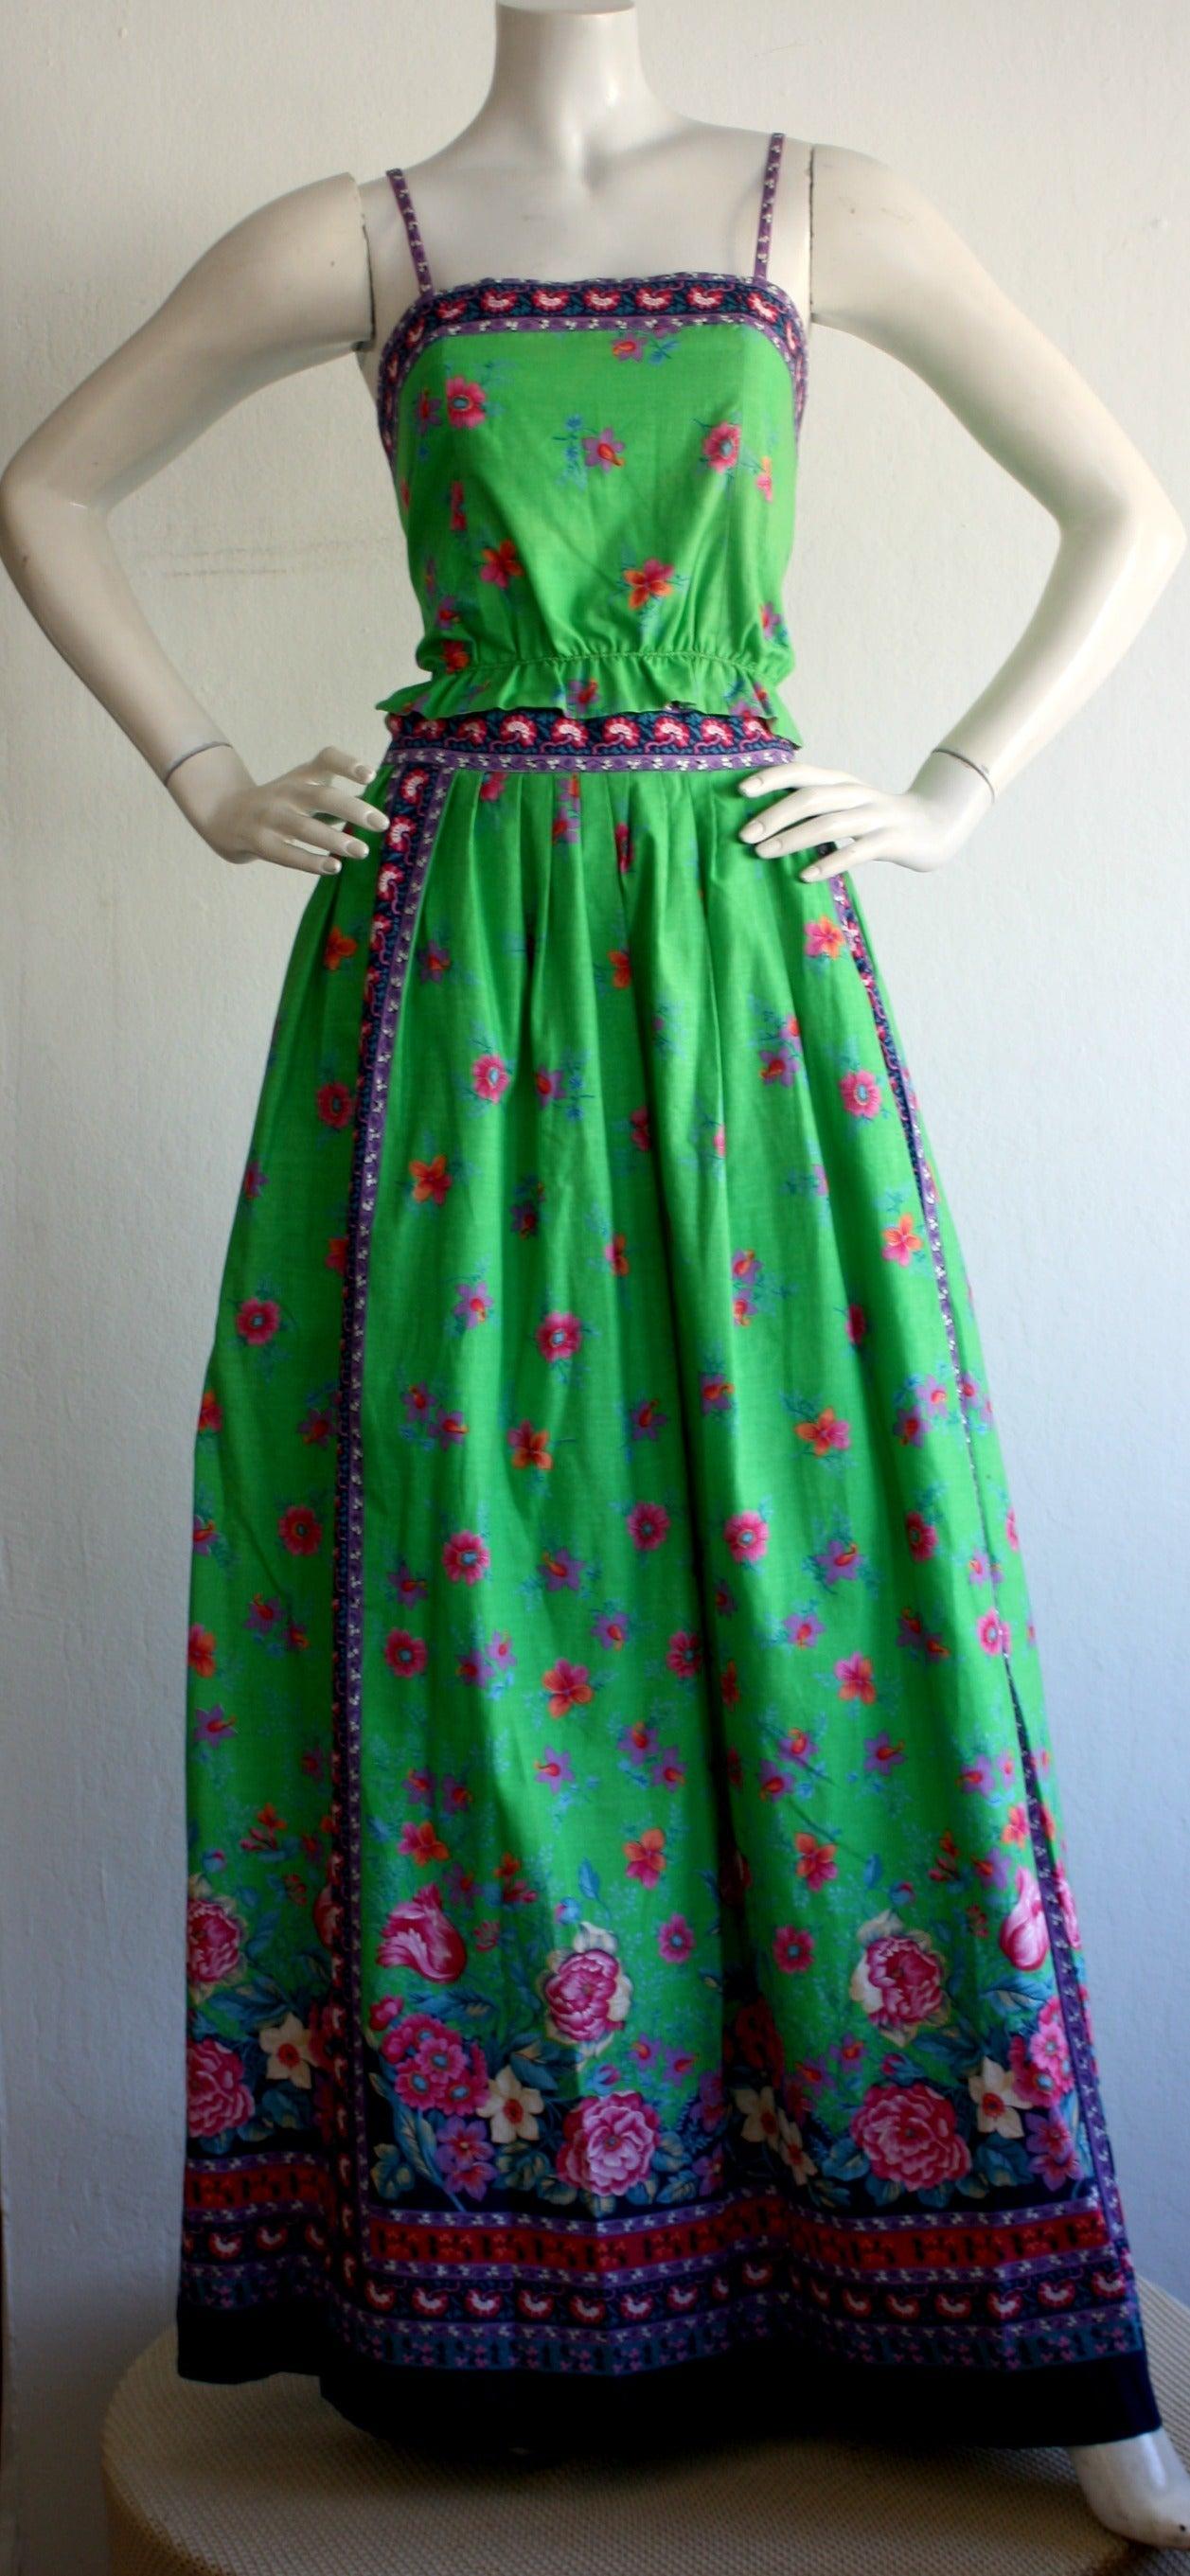 1960s Vintage Tina Leser Green Floral Print 2 - Piece Dress Ensemble 4